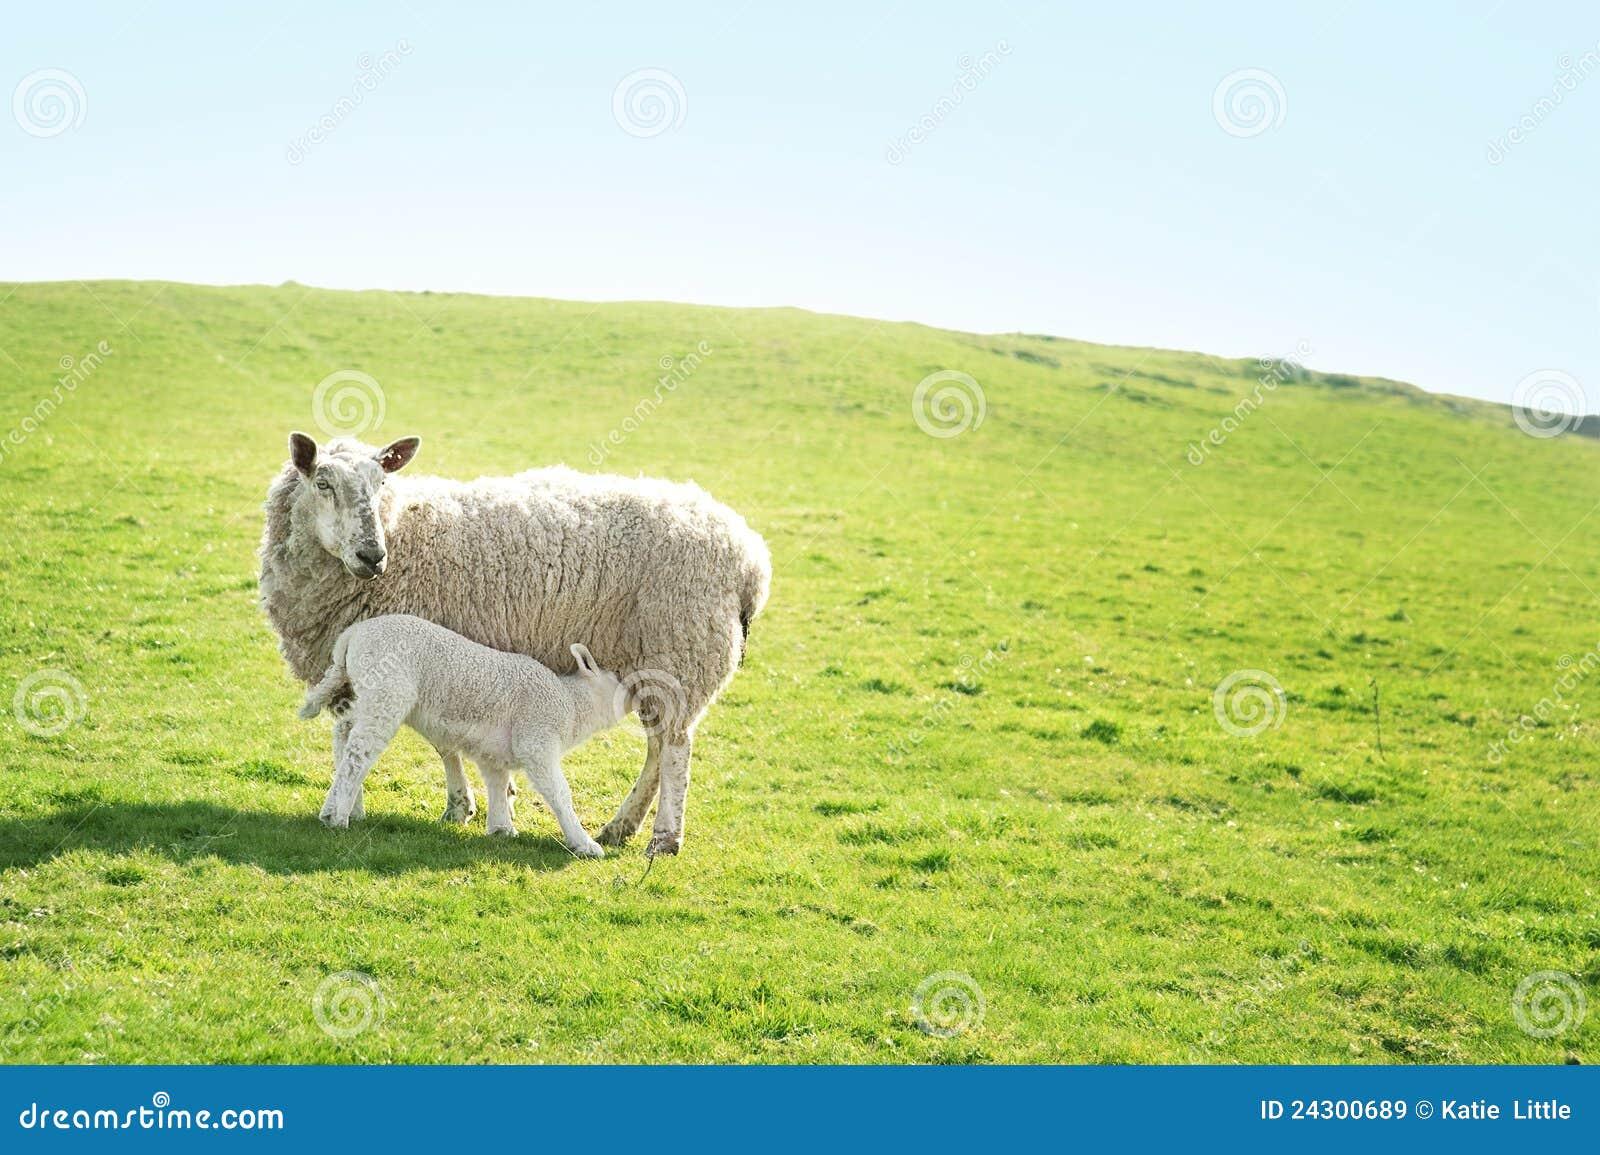 Ewe feeding her lamb